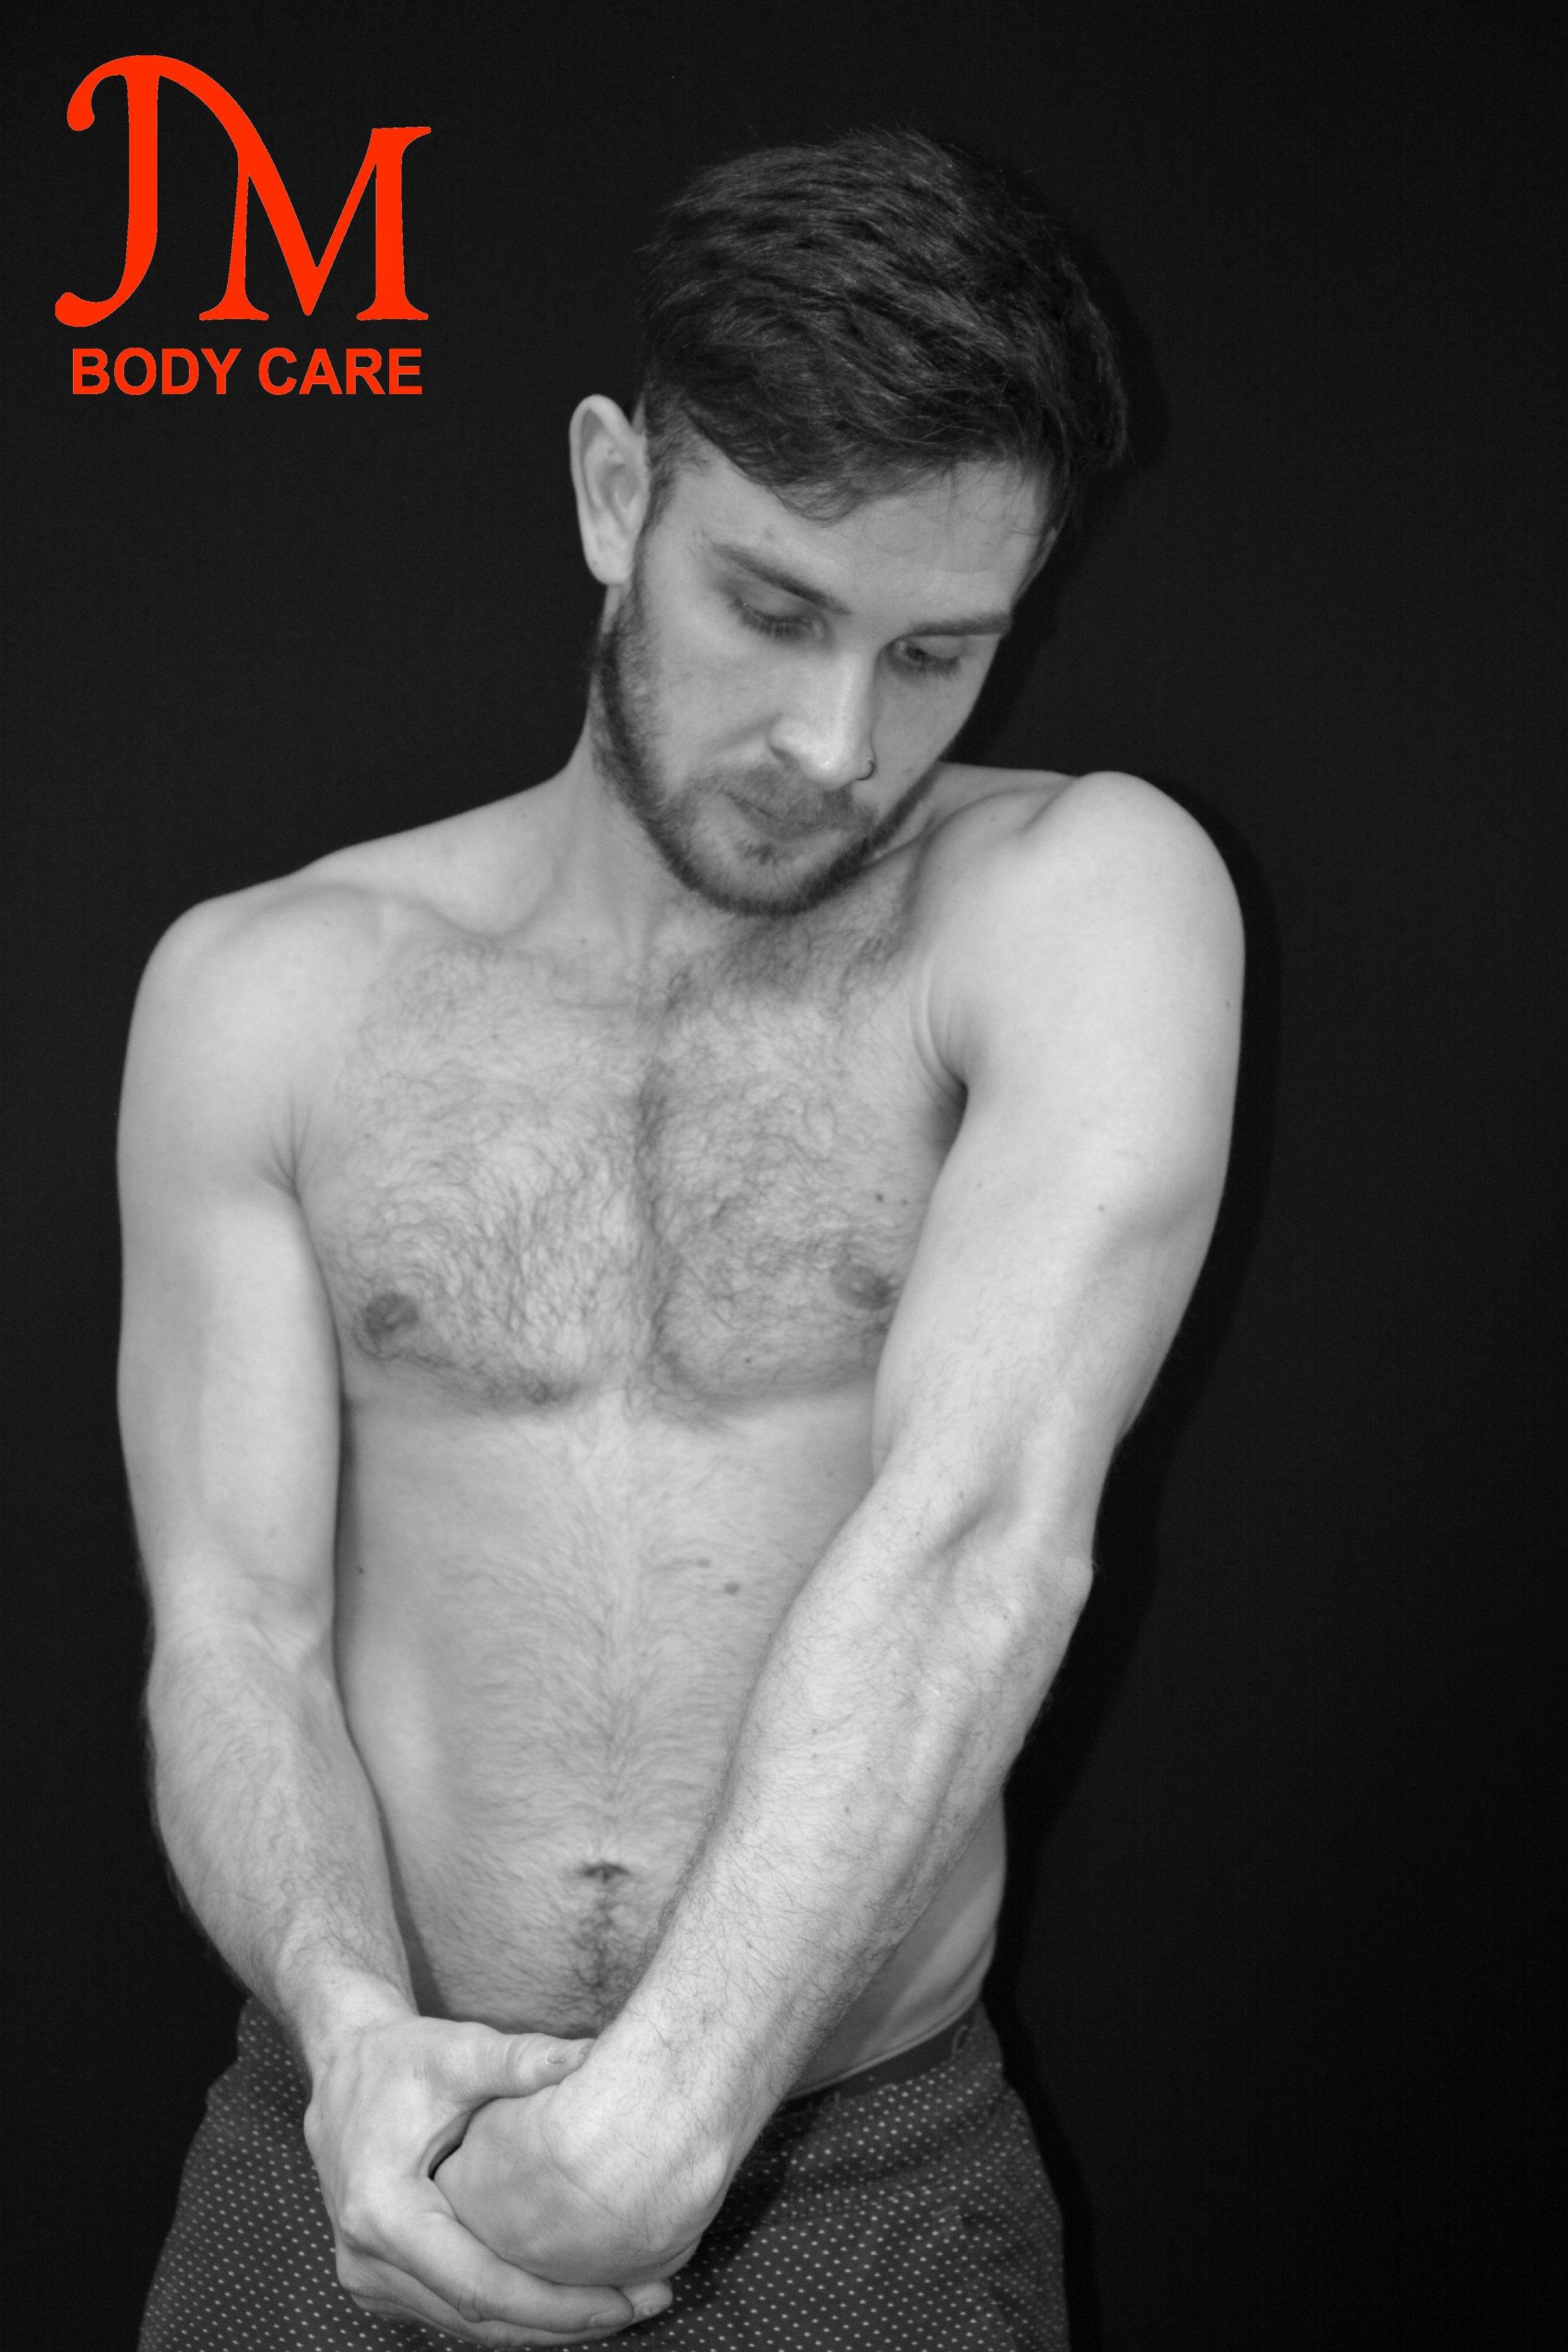 Stretches | JM Body Care